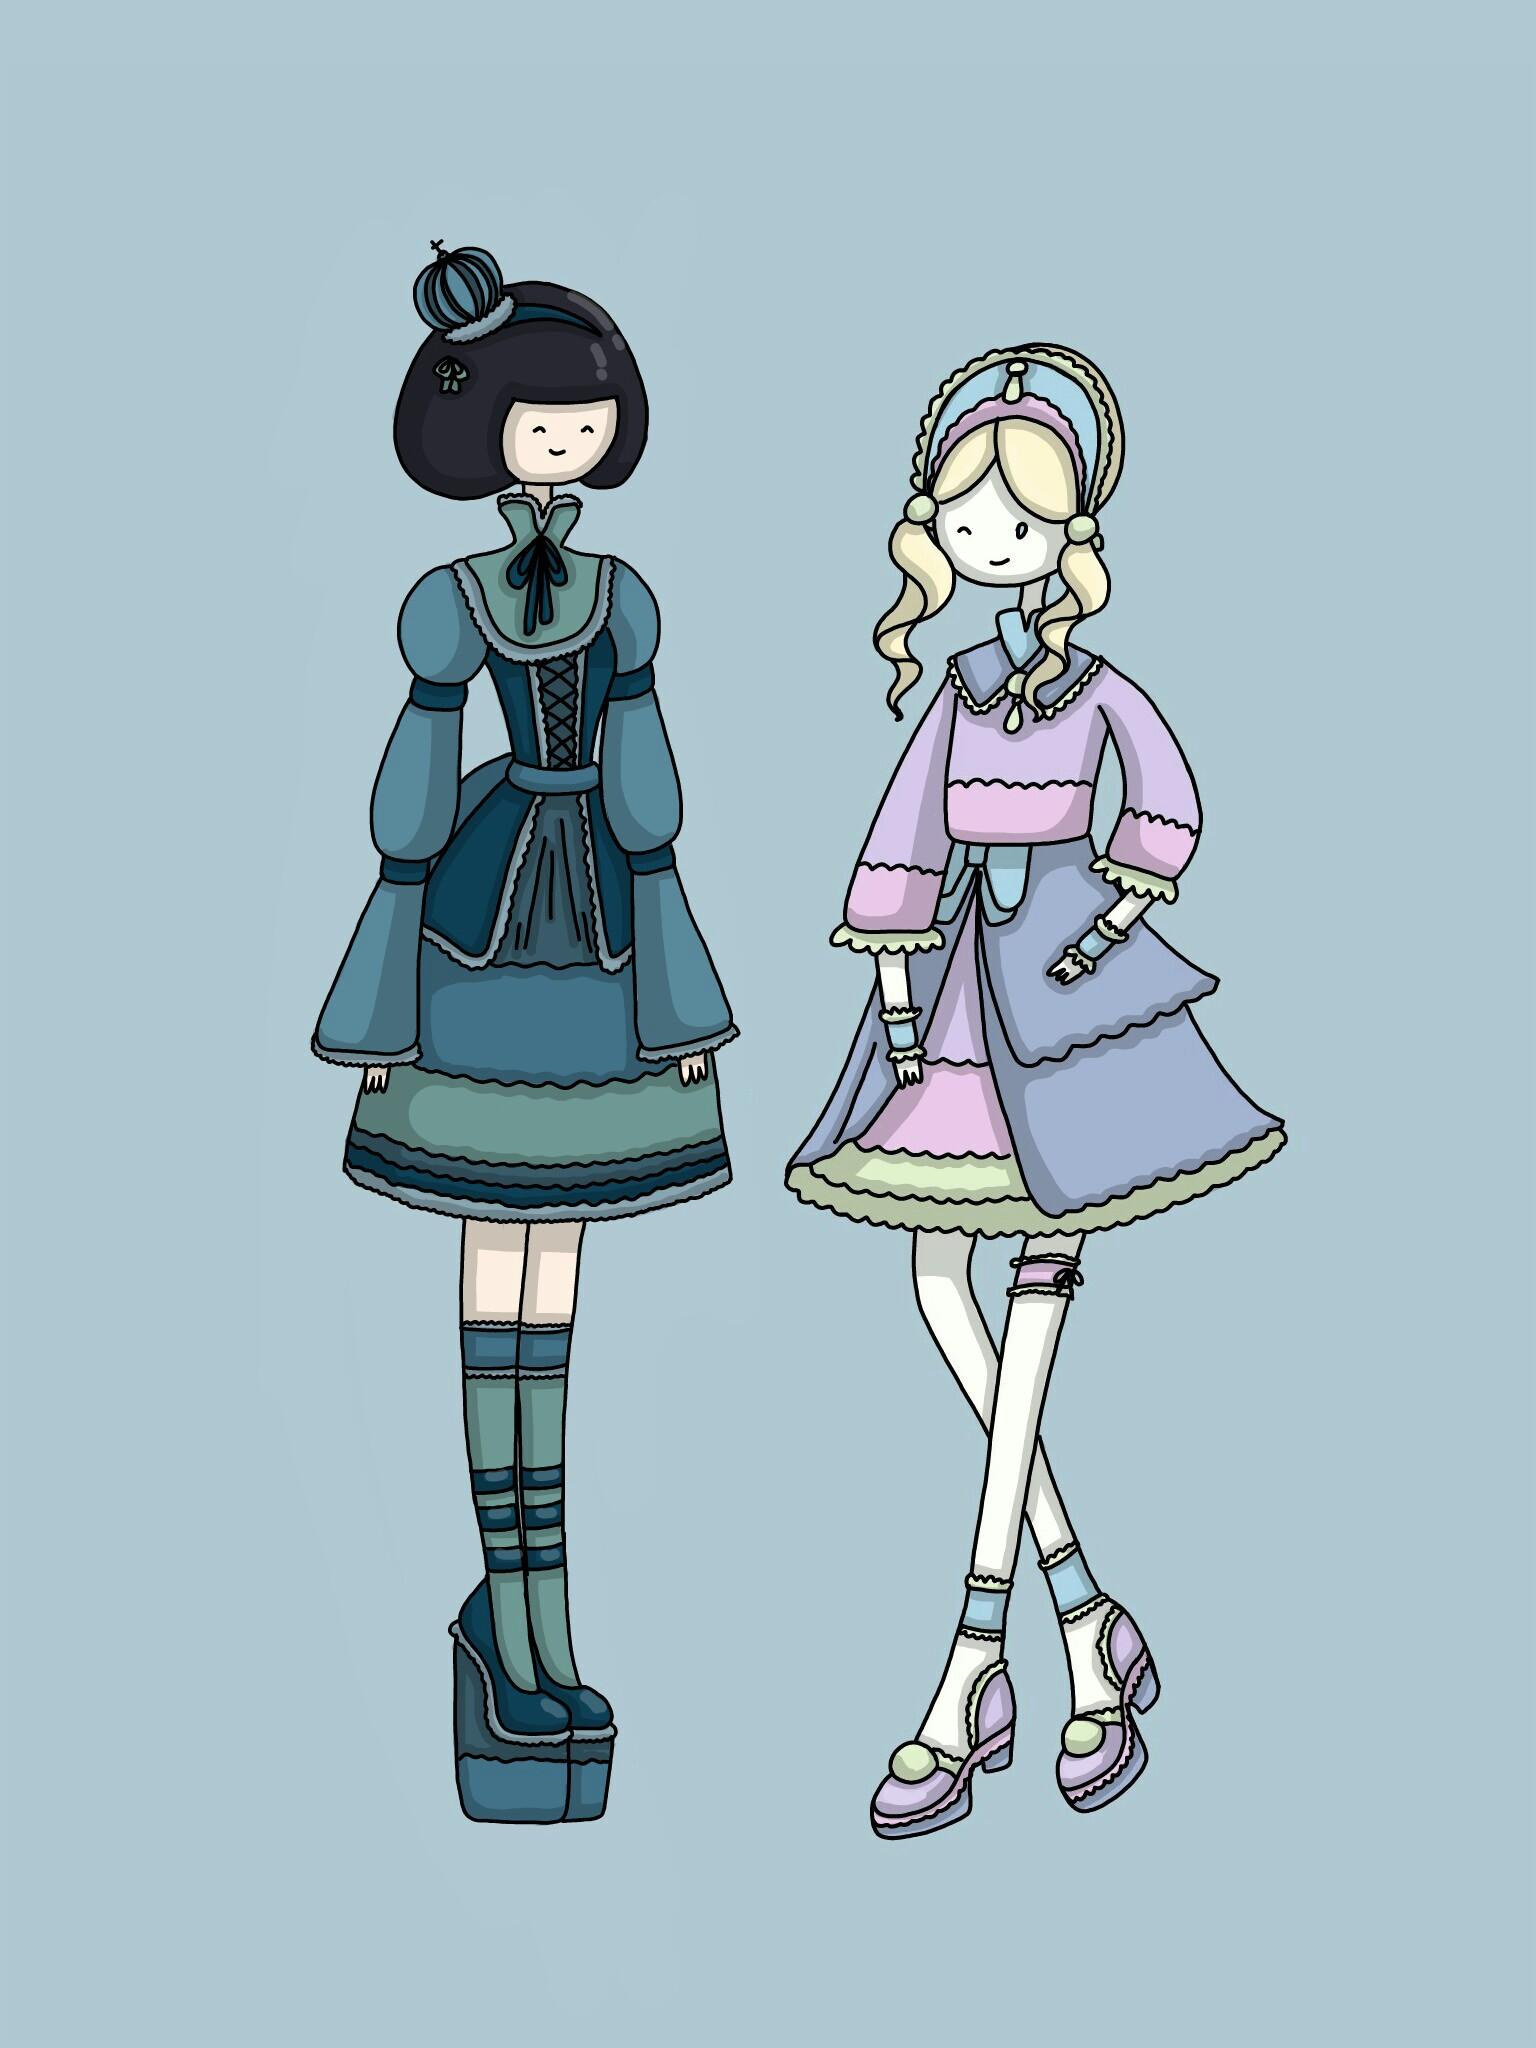 salazzle (pokemon) drawn by hime_(ohime_pkg)   Danbooru